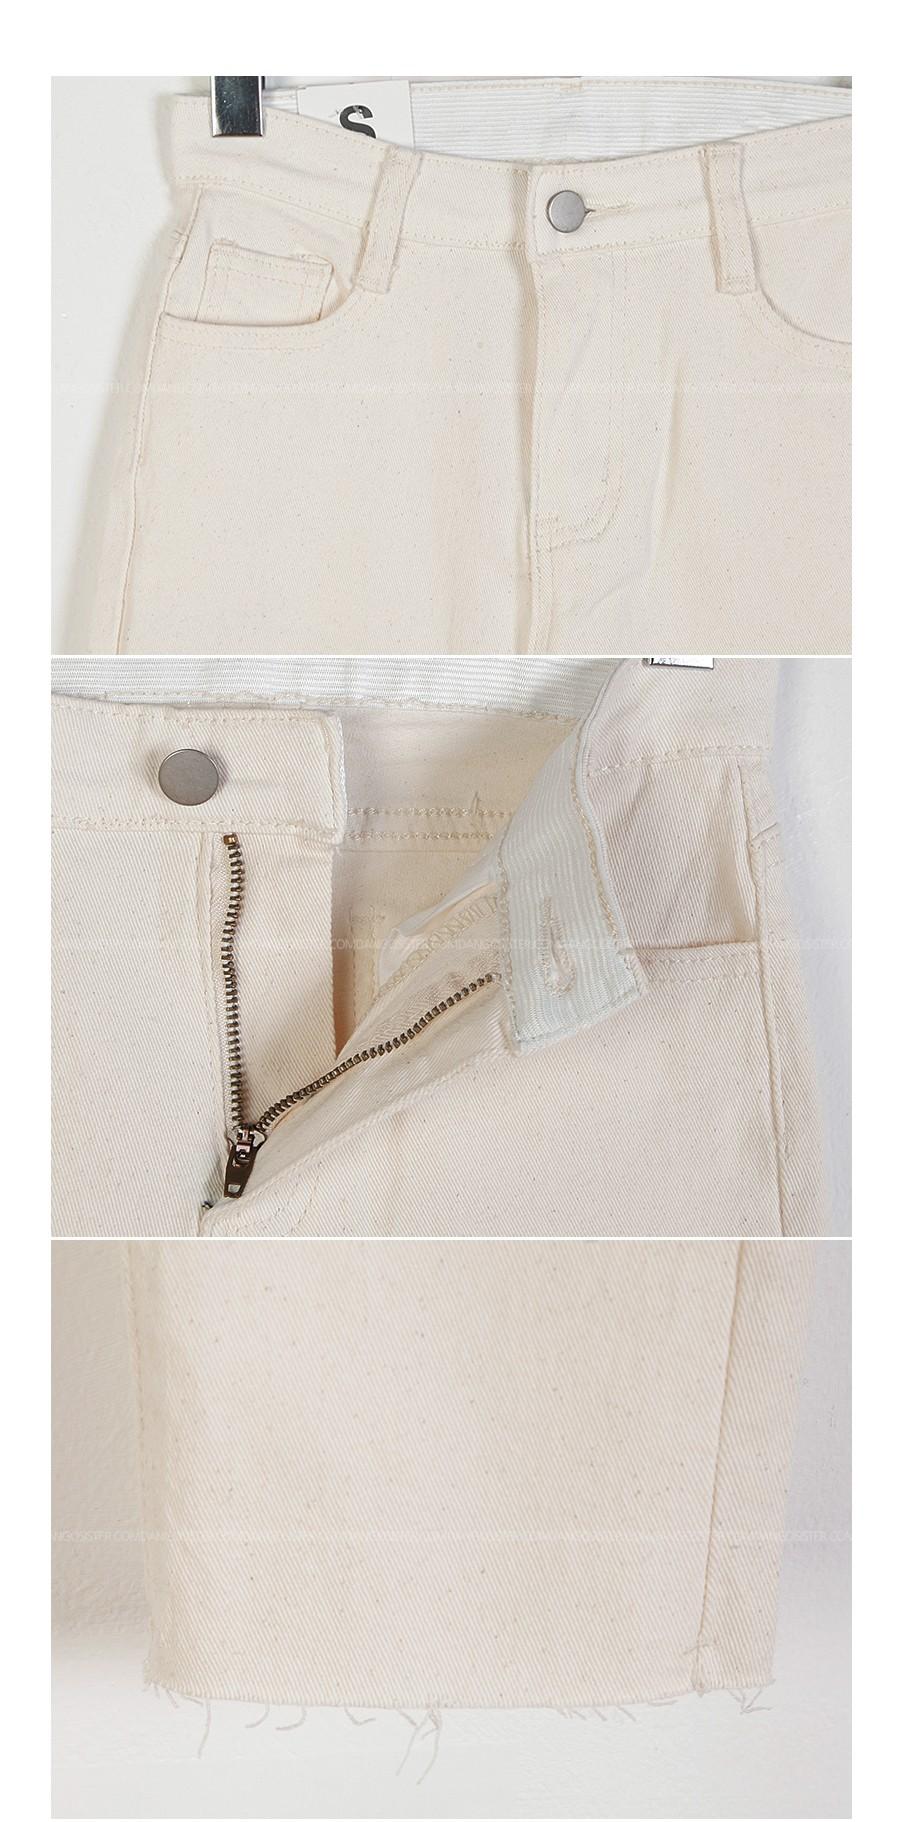 ★Denim planning★Davi Cotton Date PT♥ Waist banding